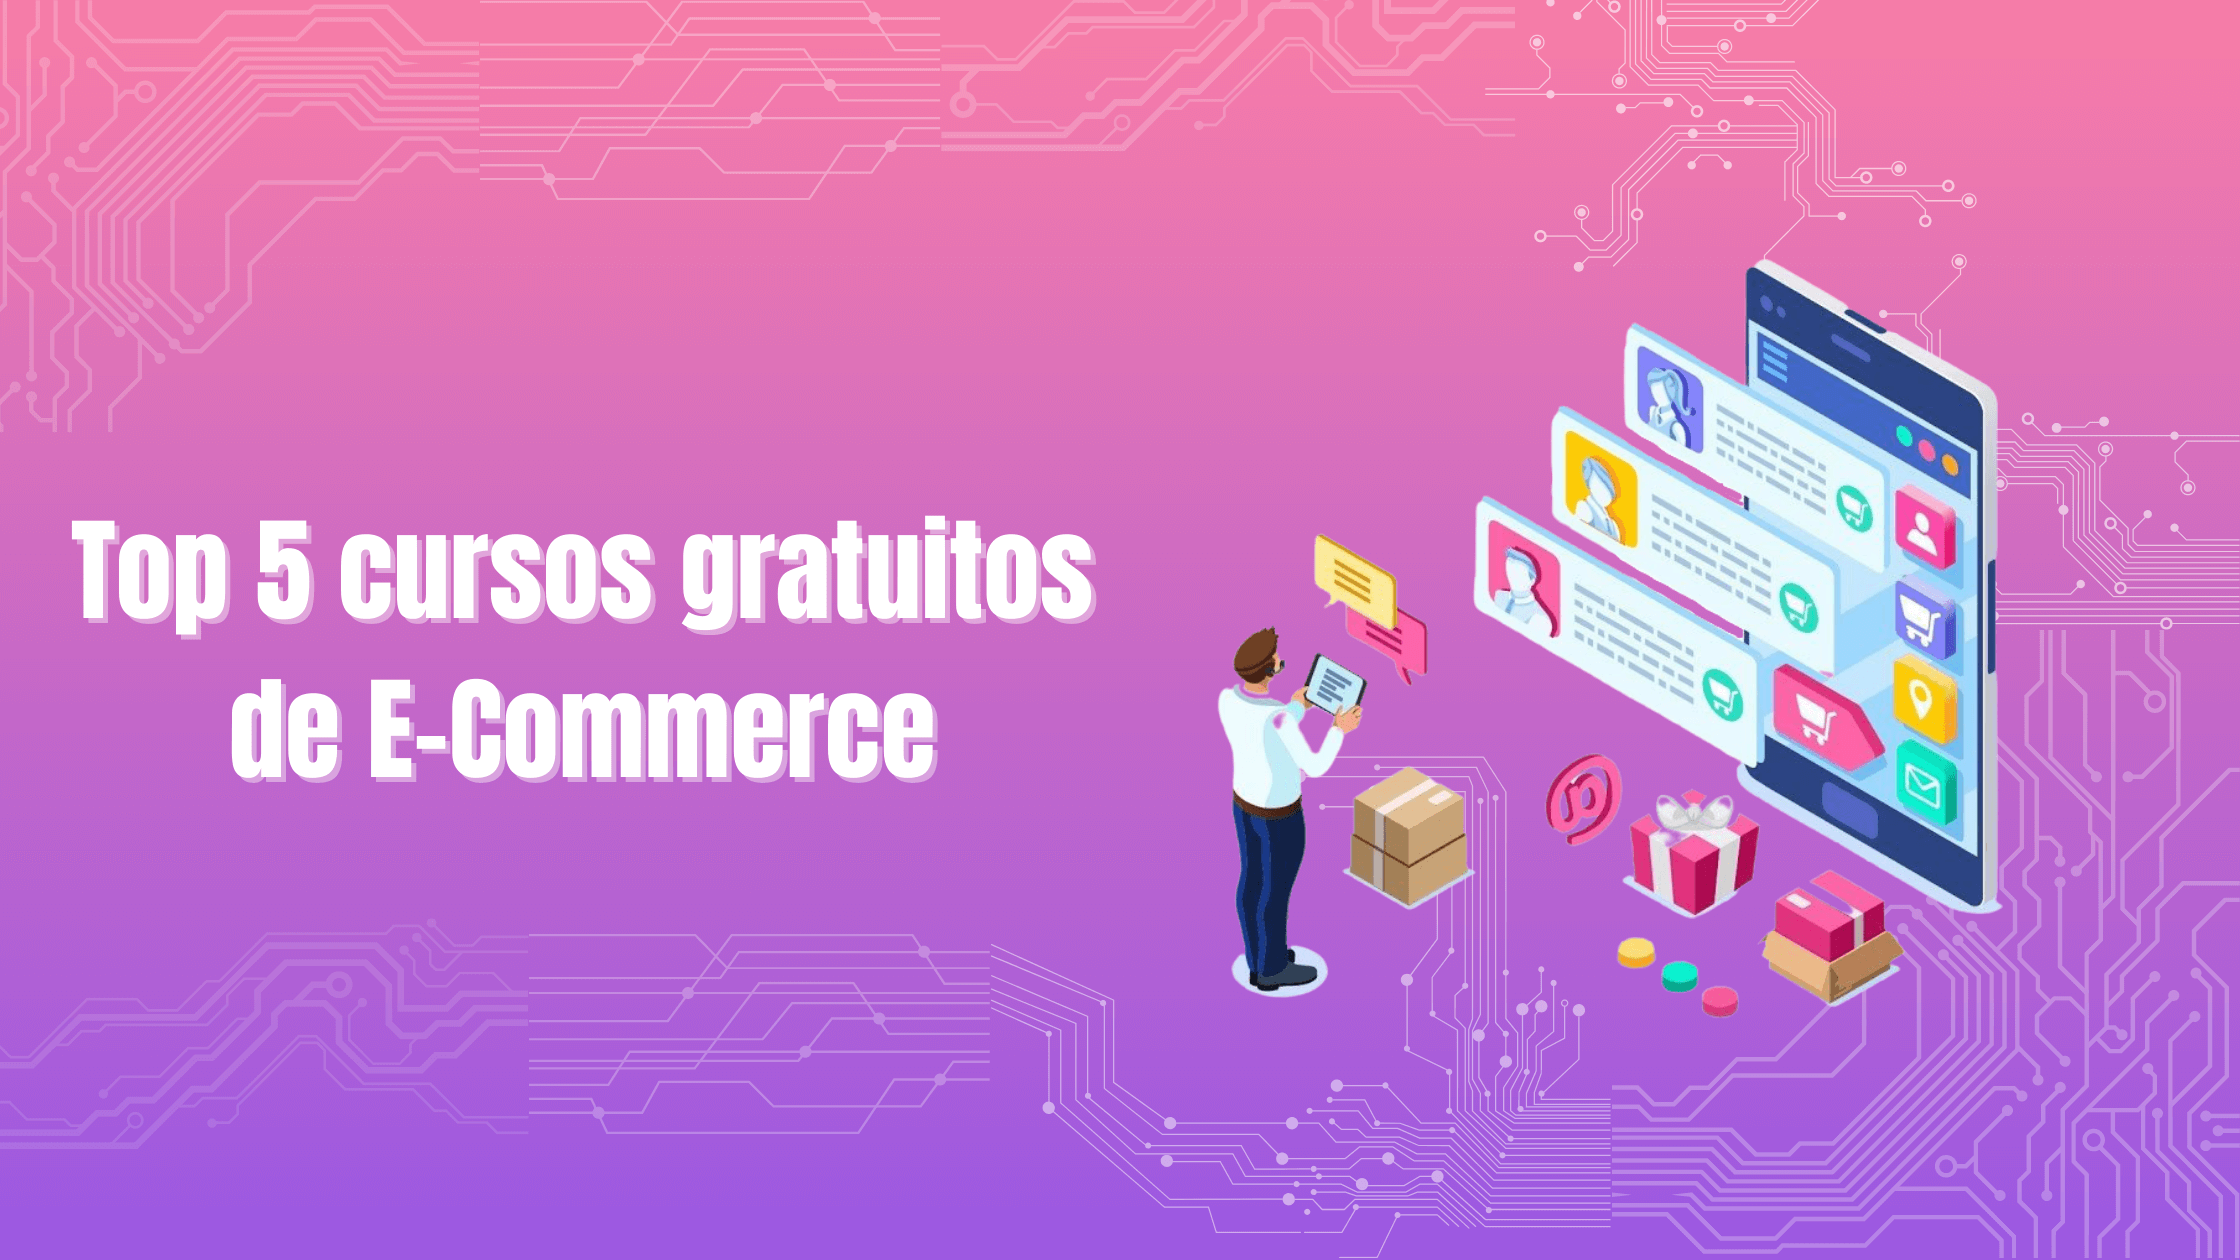 Top 5 cursos gratuitos de E-commerce